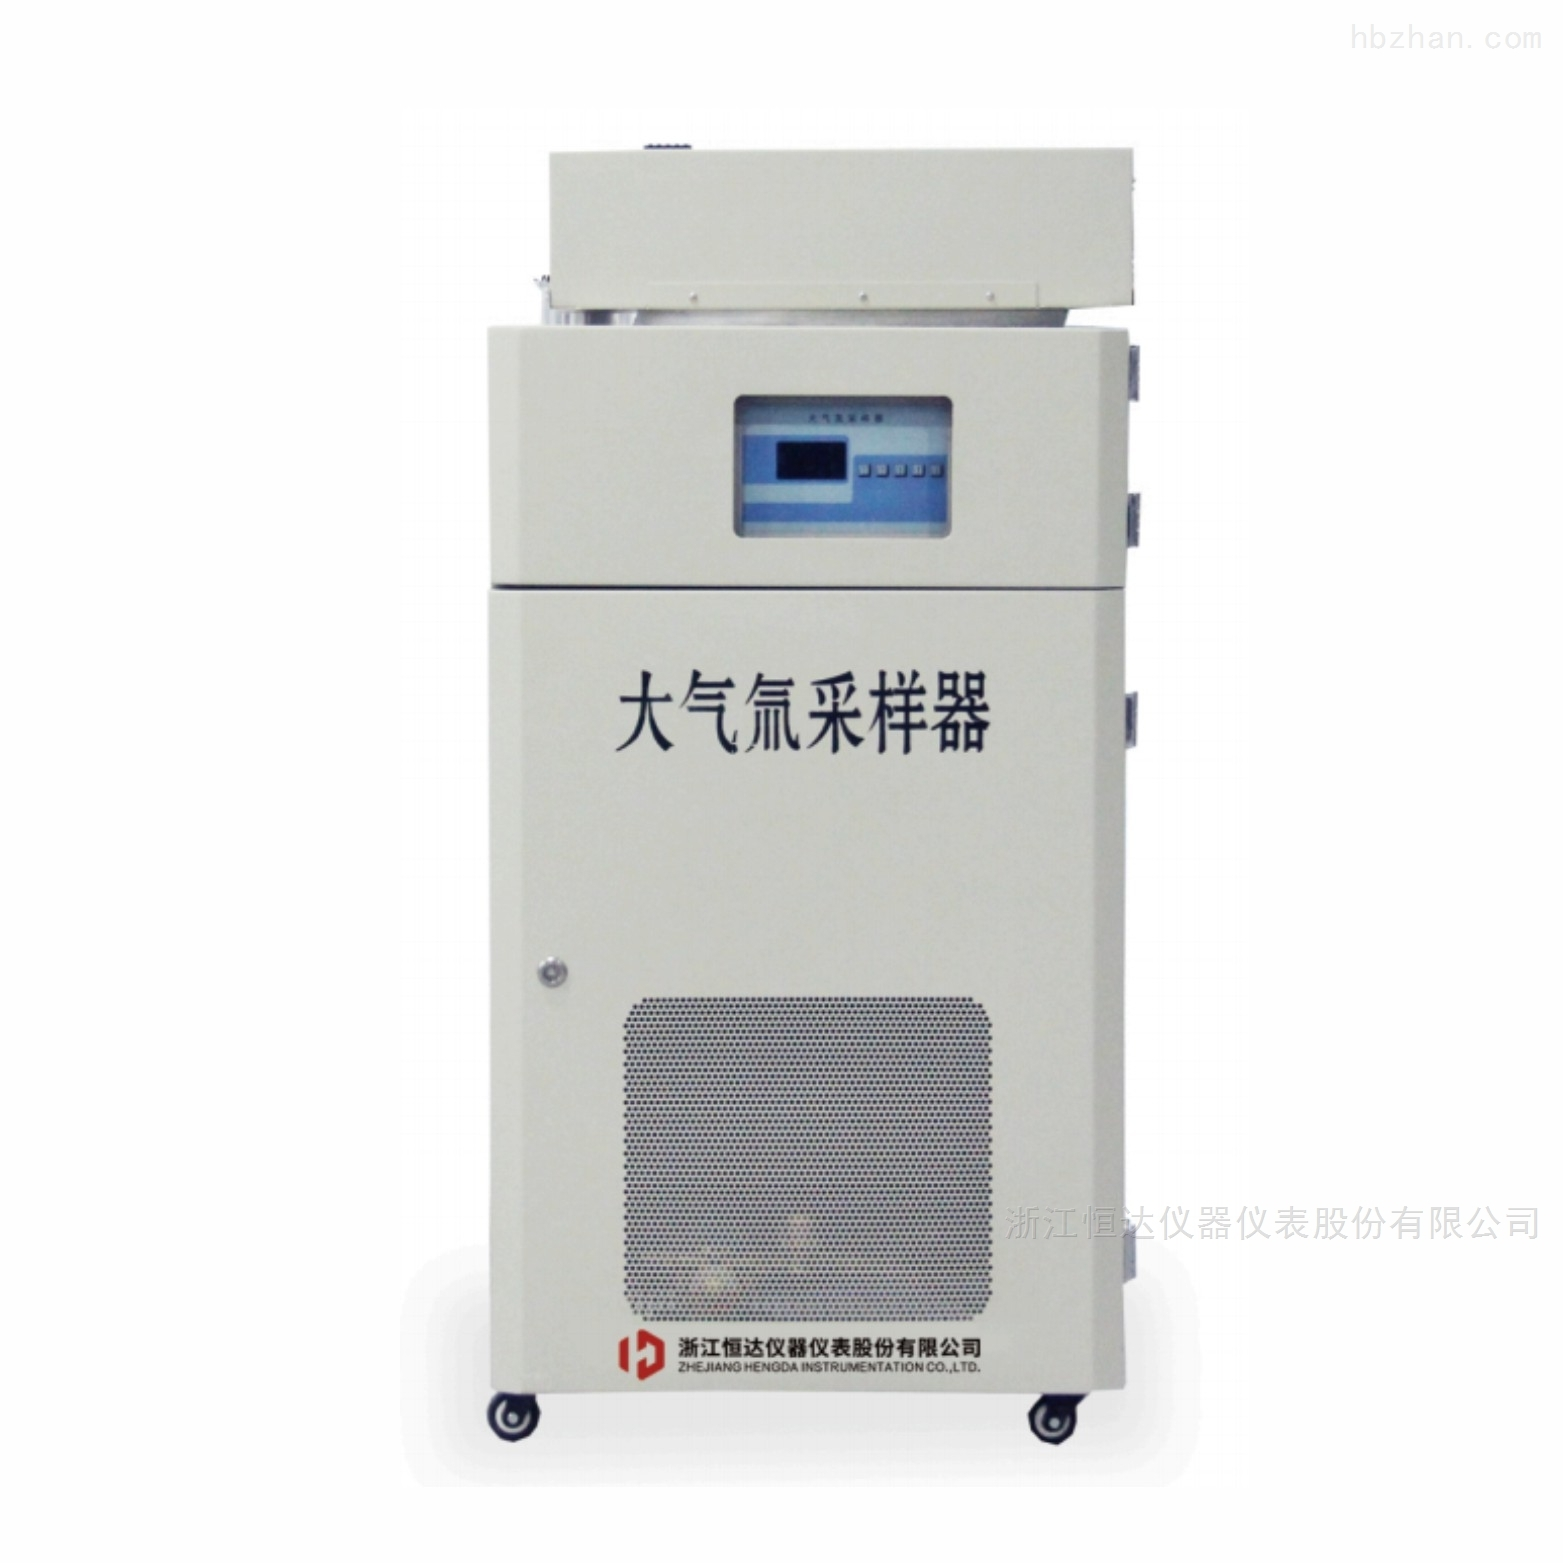 ZC-Q0152G大气氚采样器